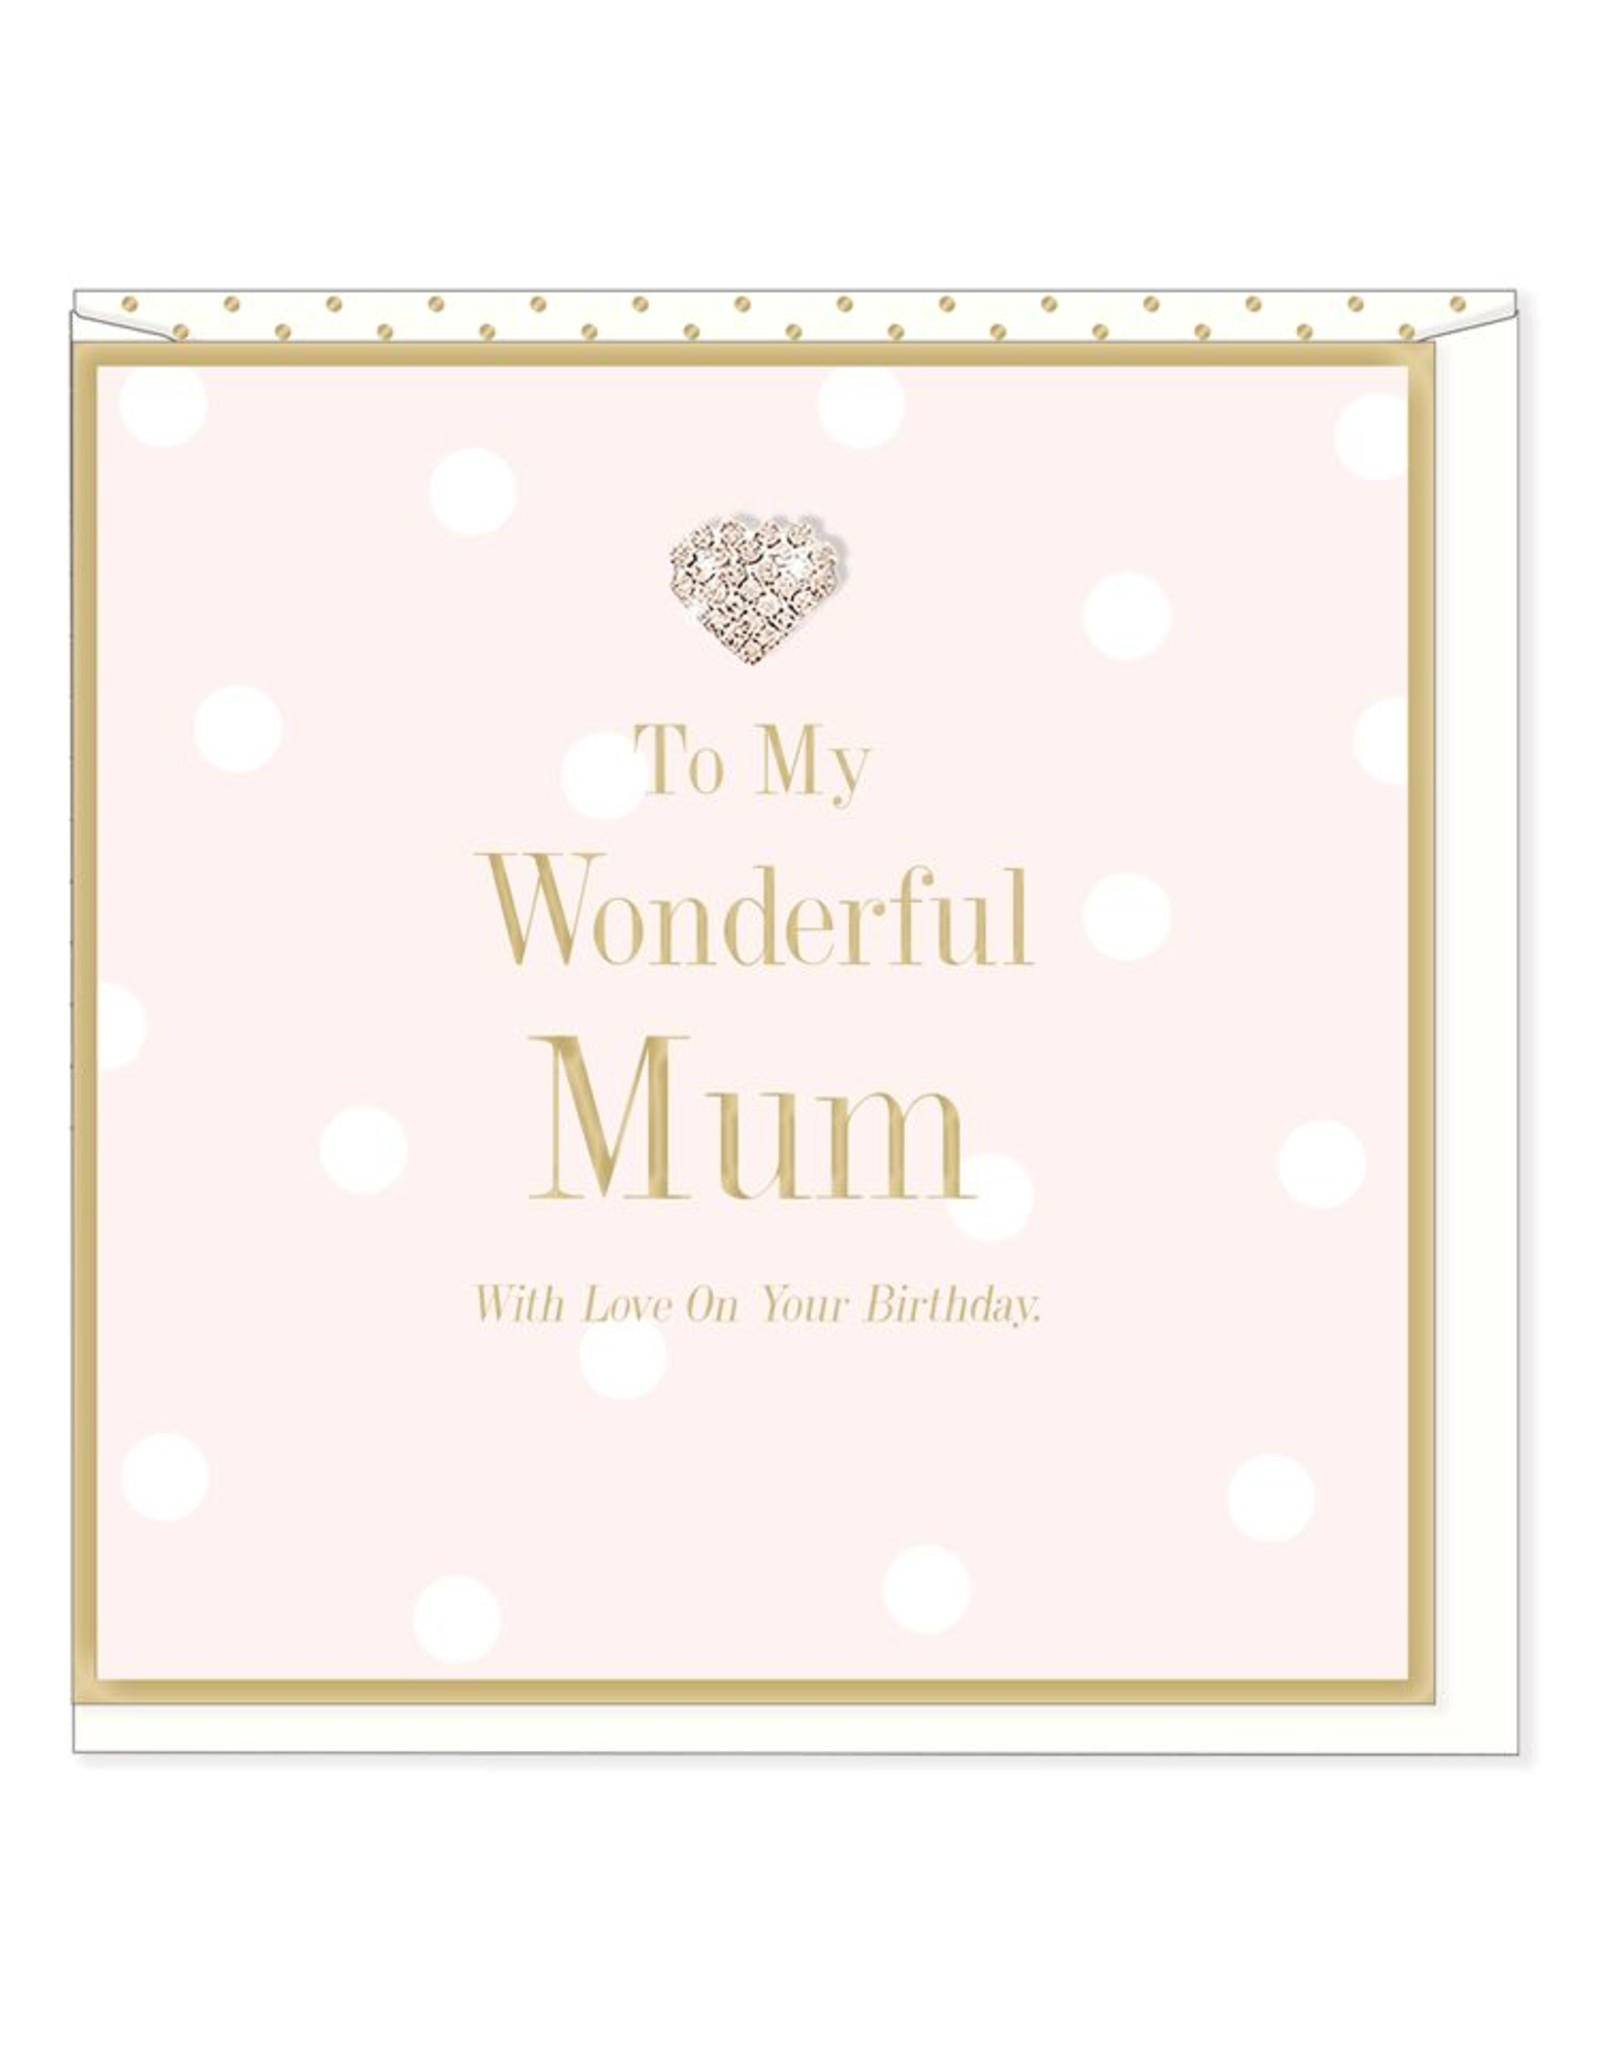 Hearts Design Wenskaart - Wonderful Mum - Birthday